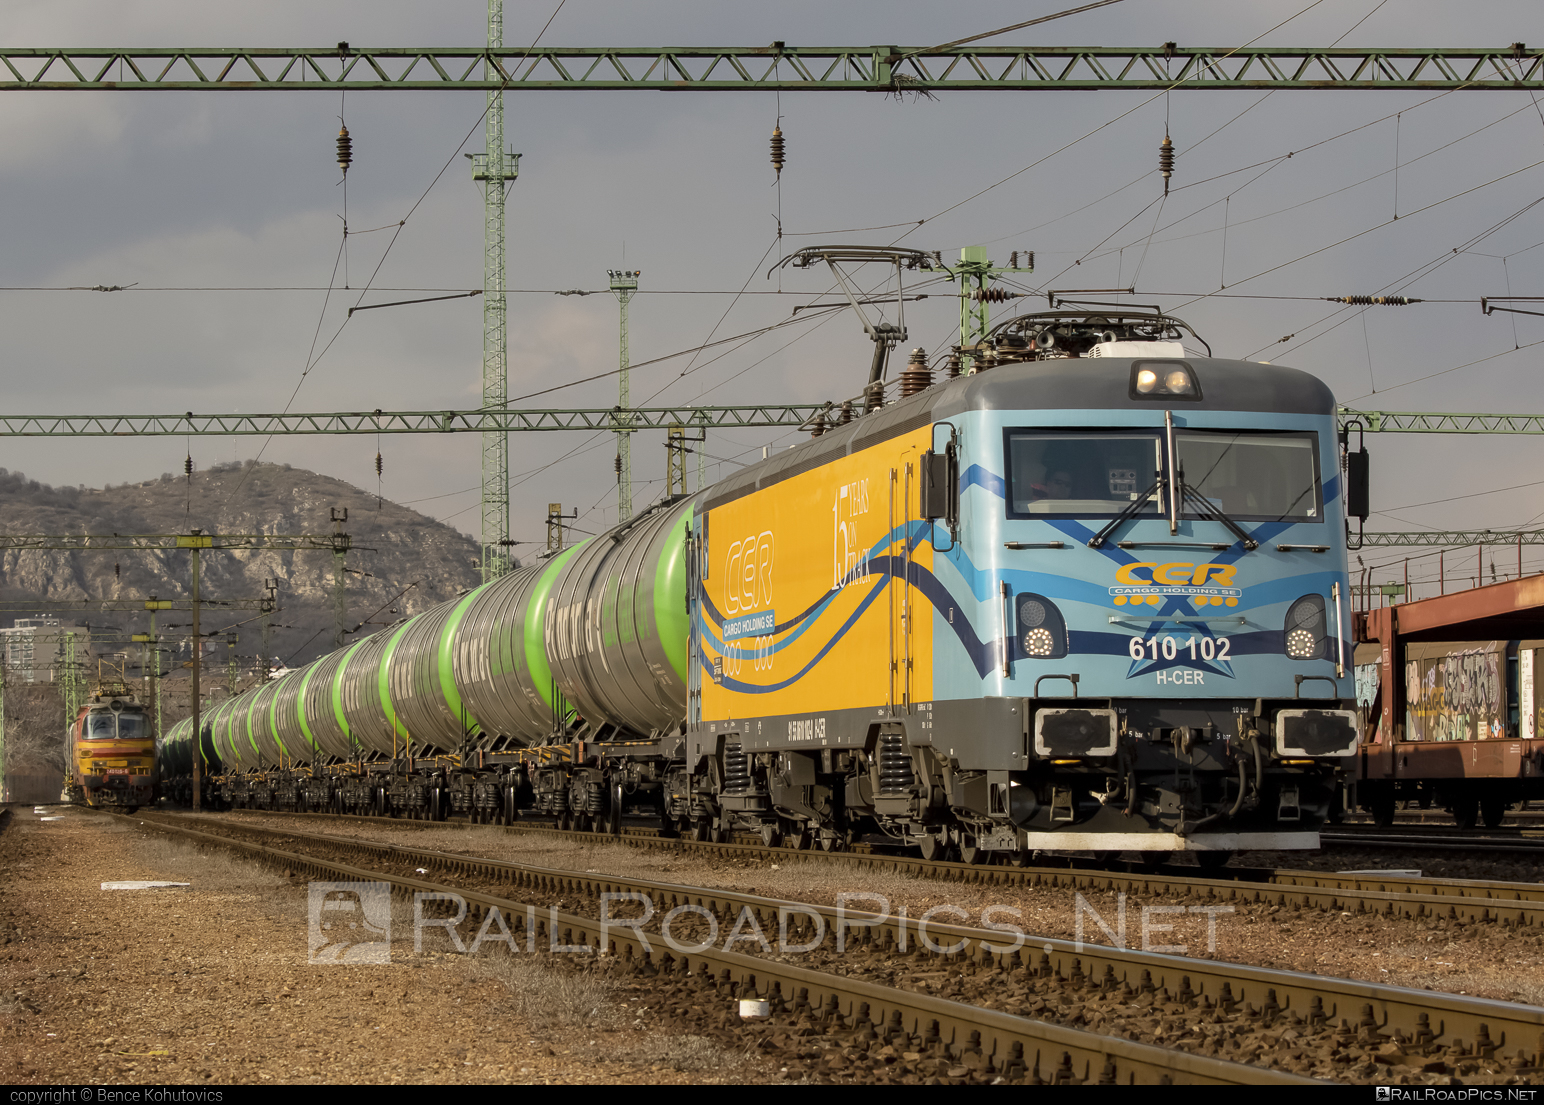 Softronic Transmontana - 610 102 operated by CER Cargo Holding SE #cer #cercargoholding #cercargoholdingse #kesselwagen #softronic #softronictransmontana #tankwagon #transmontana